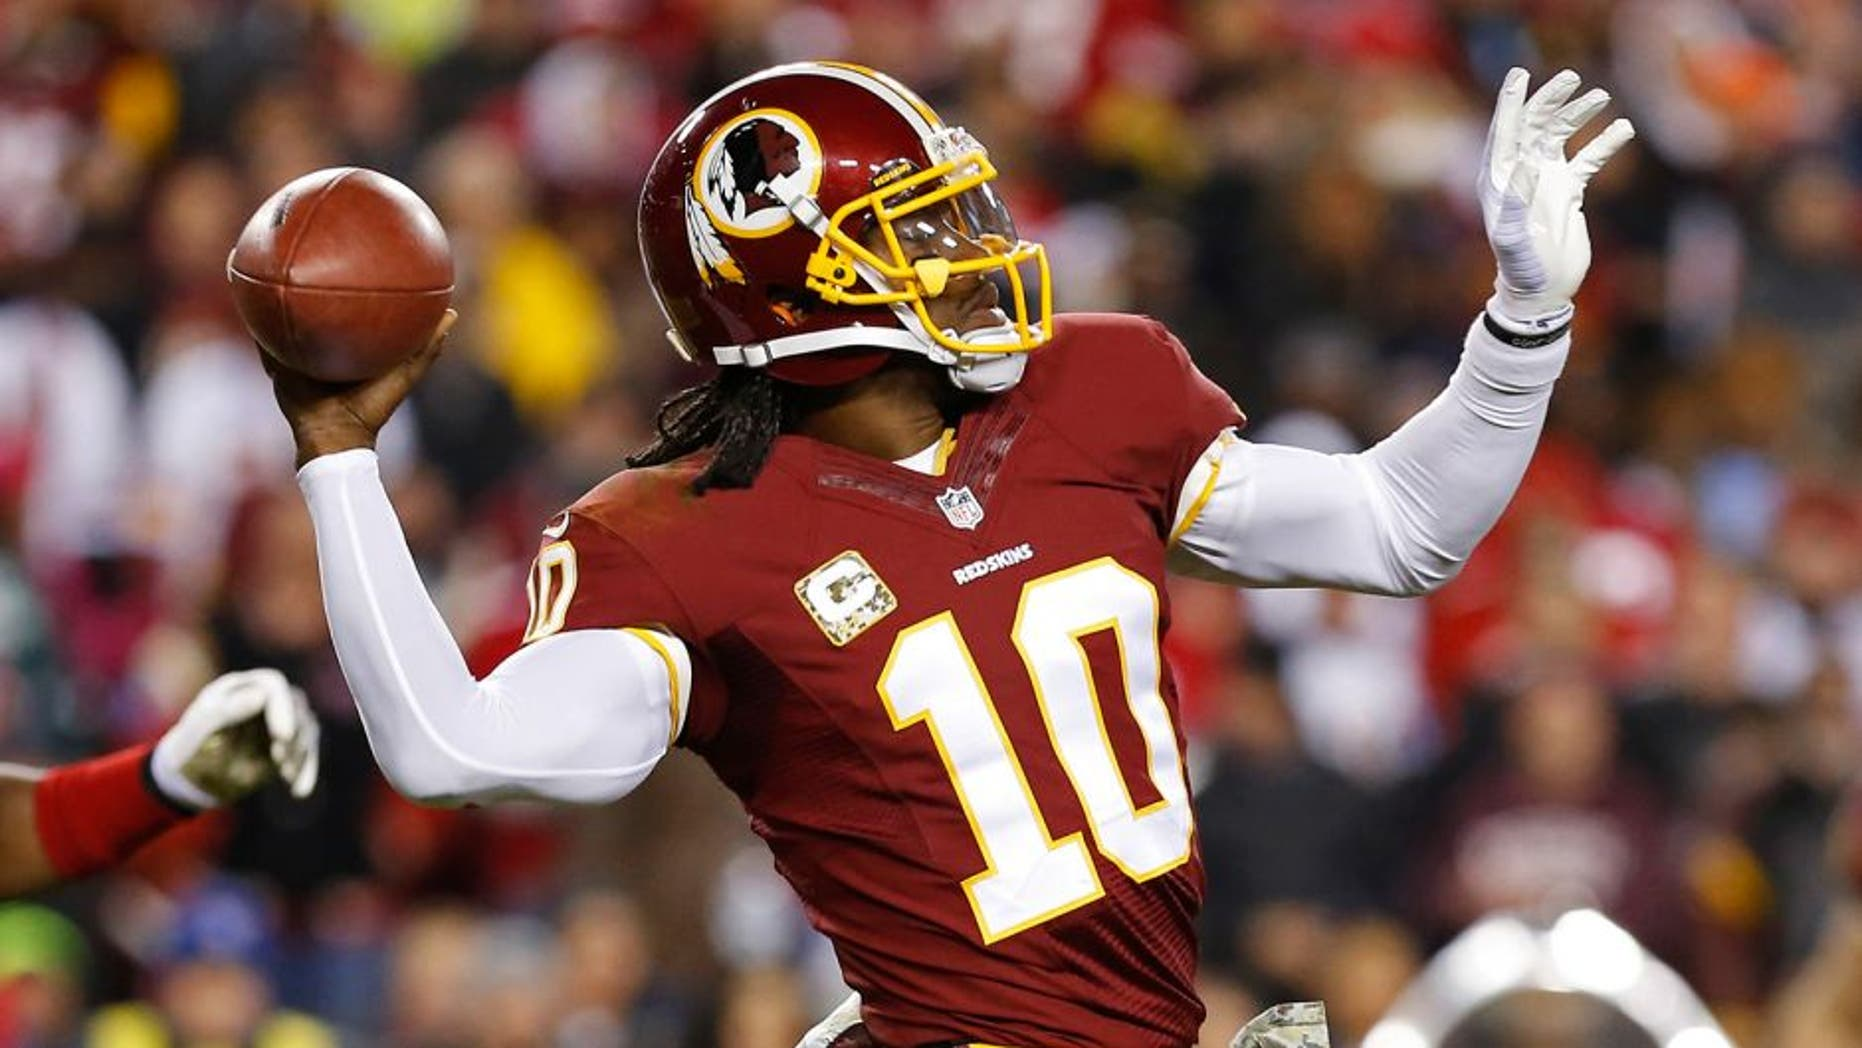 Nov 25, 2013; Landover, MD, USA; Washington Redskins quarterback Robert Griffin III (10) throws the ball against the San Francisco 49ers at FedEx Field. Mandatory Credit: Geoff Burke-USA TODAY Sports